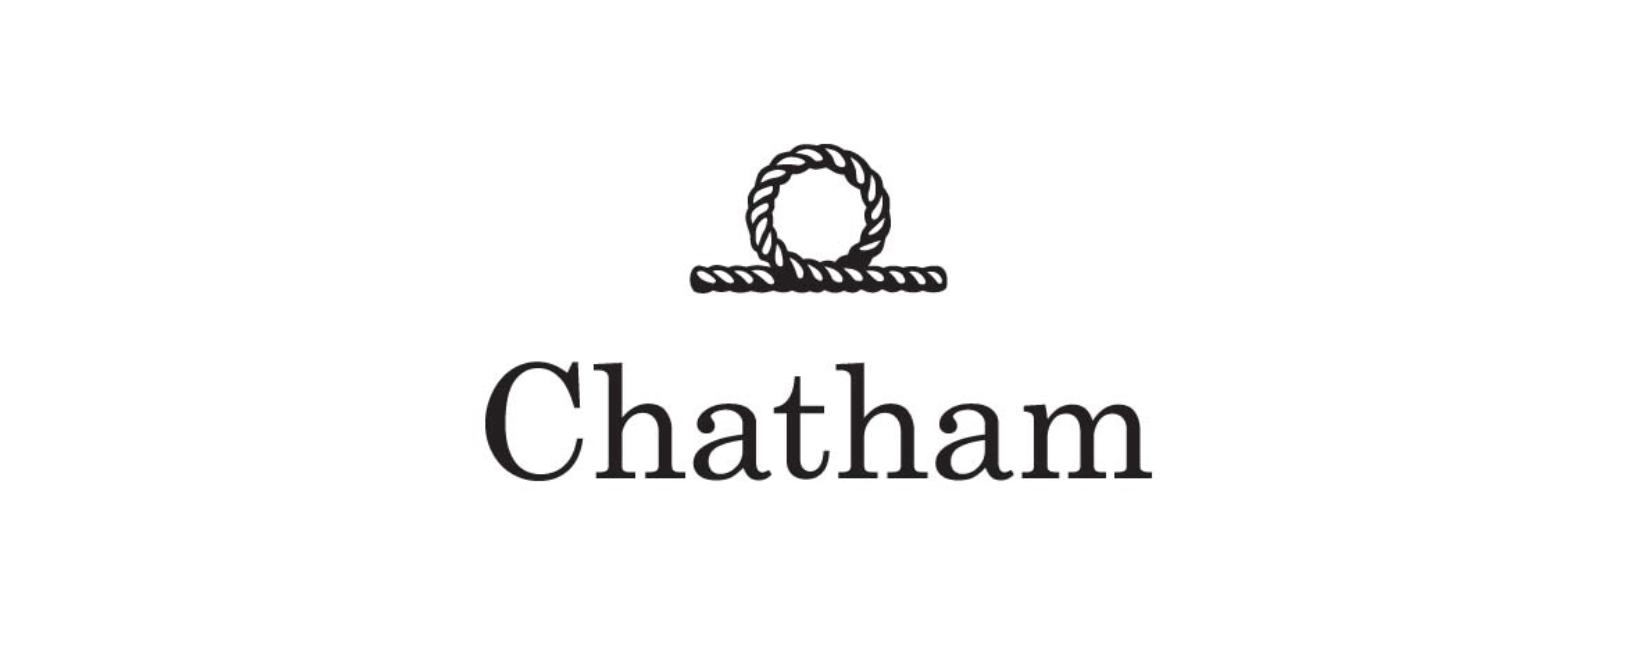 Chatham Discount Code 2021